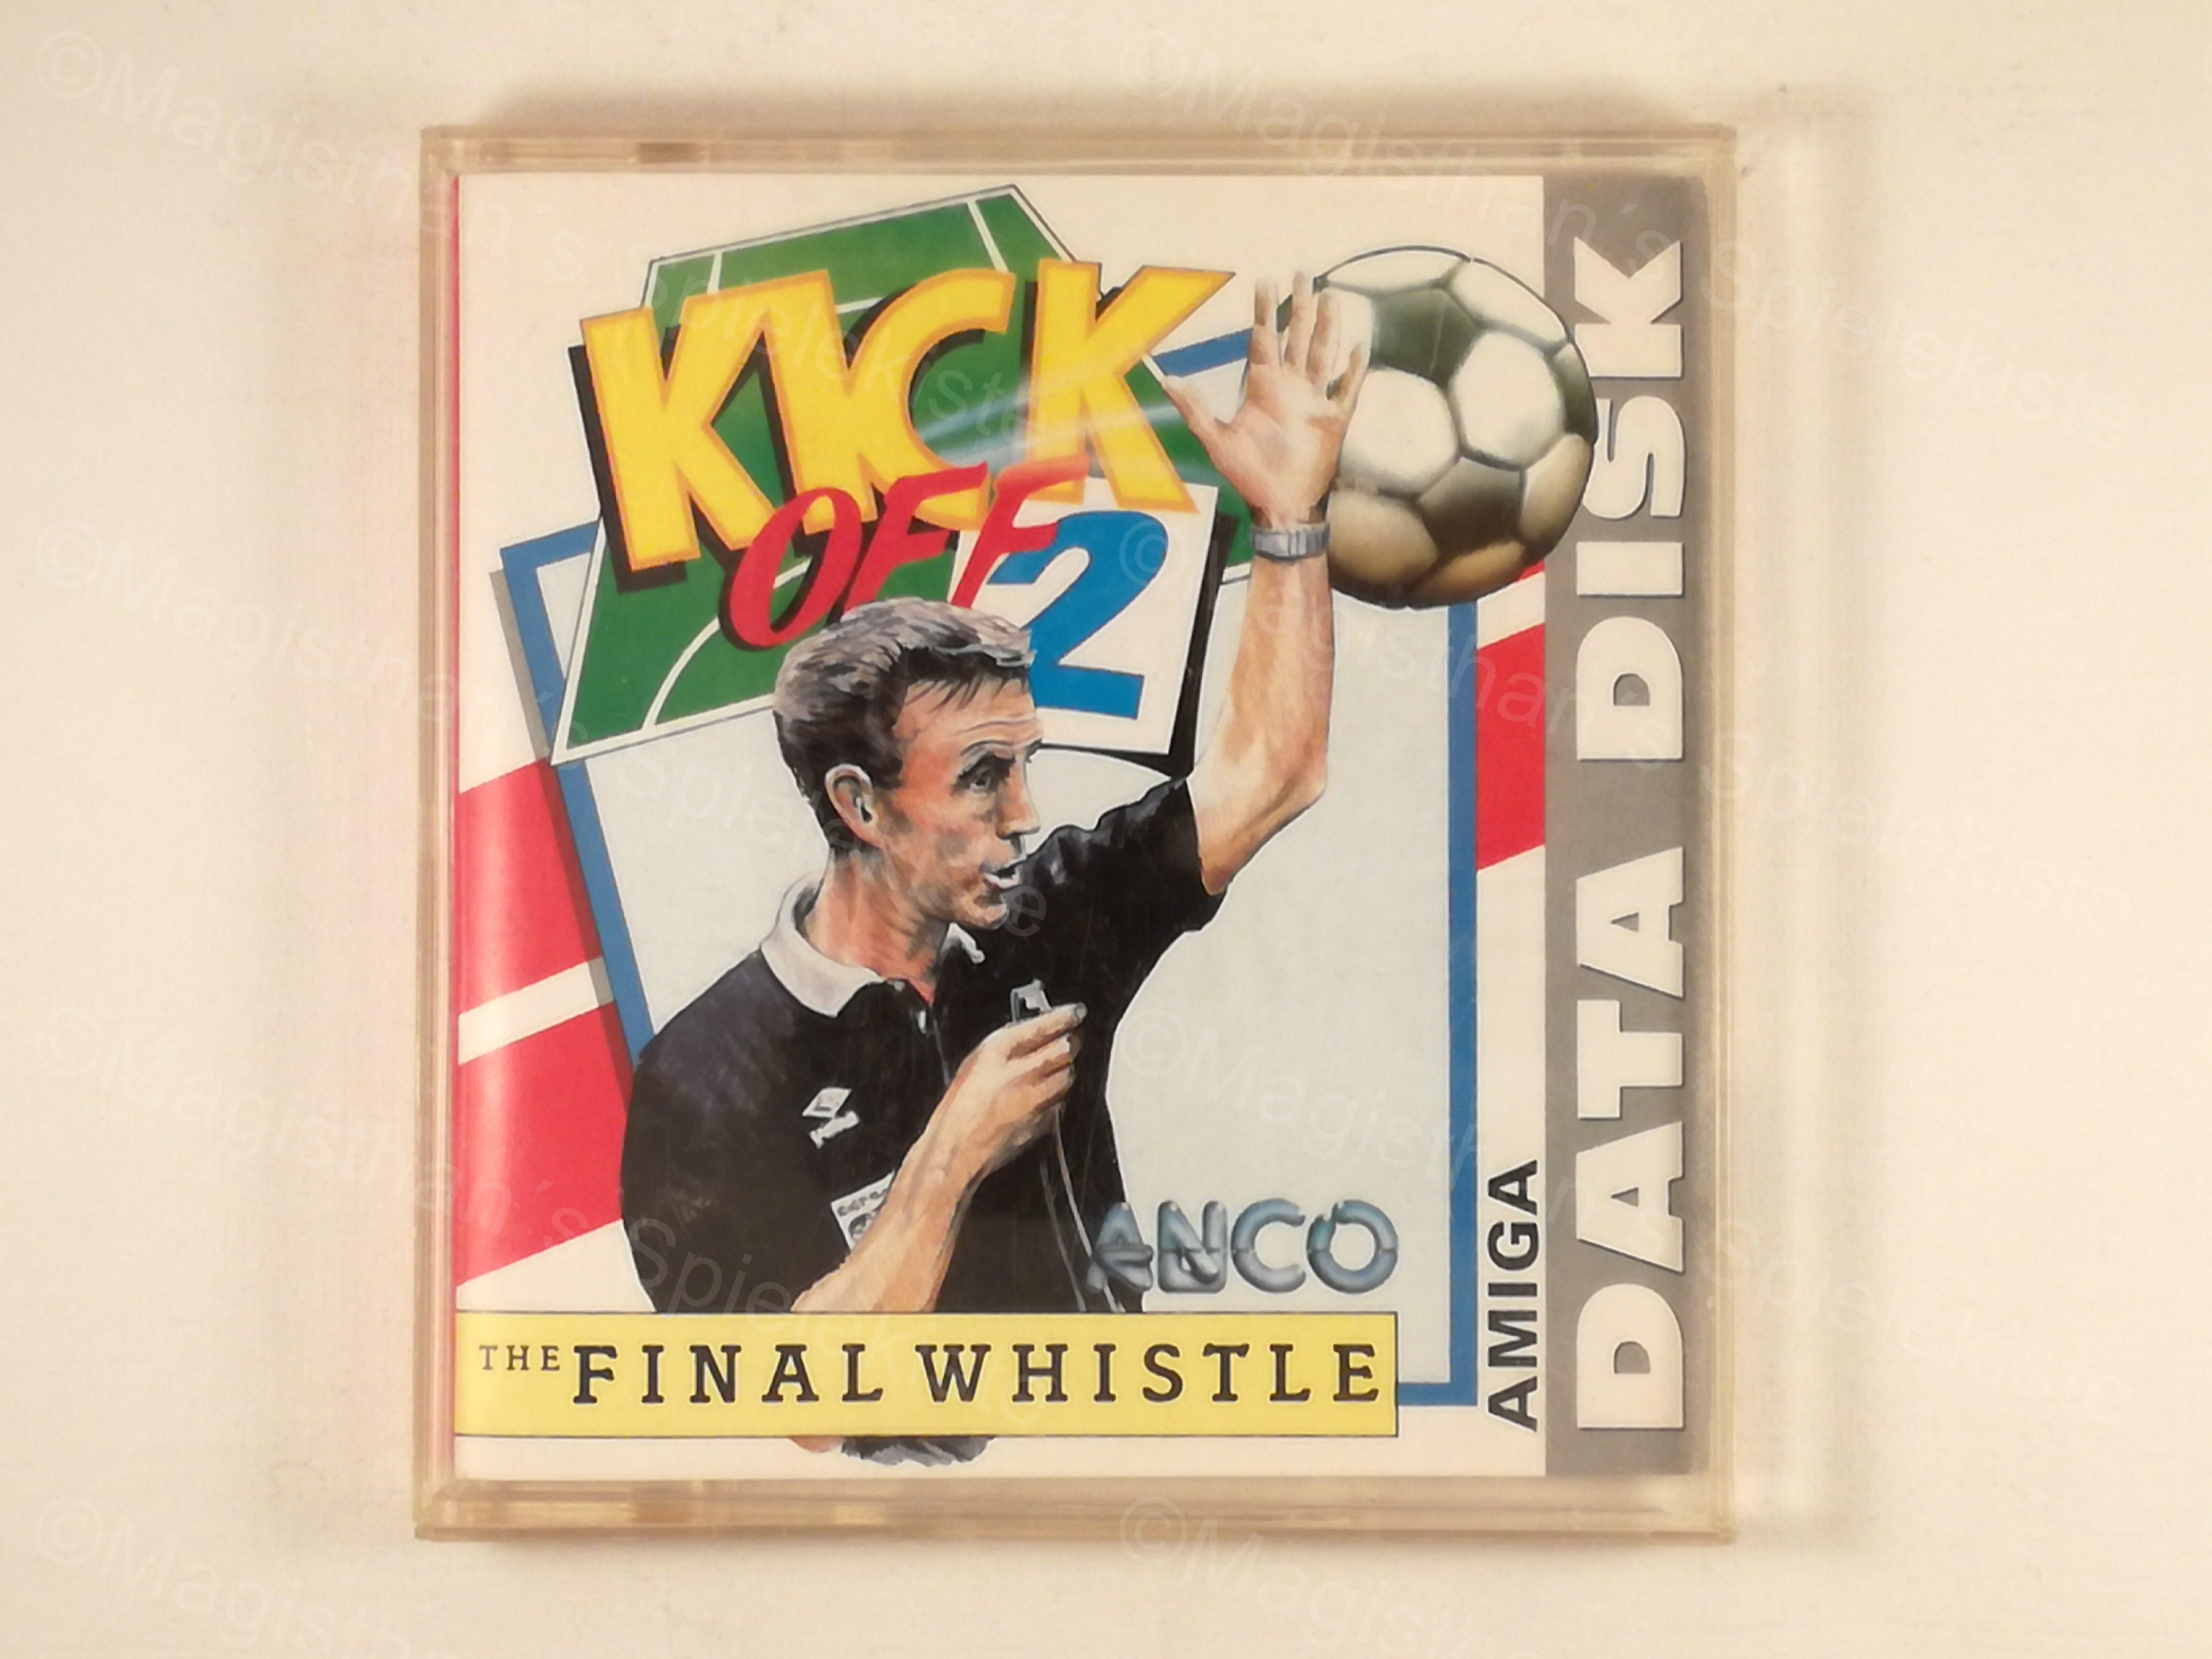 KickOff2FinalWhistle1.jpg